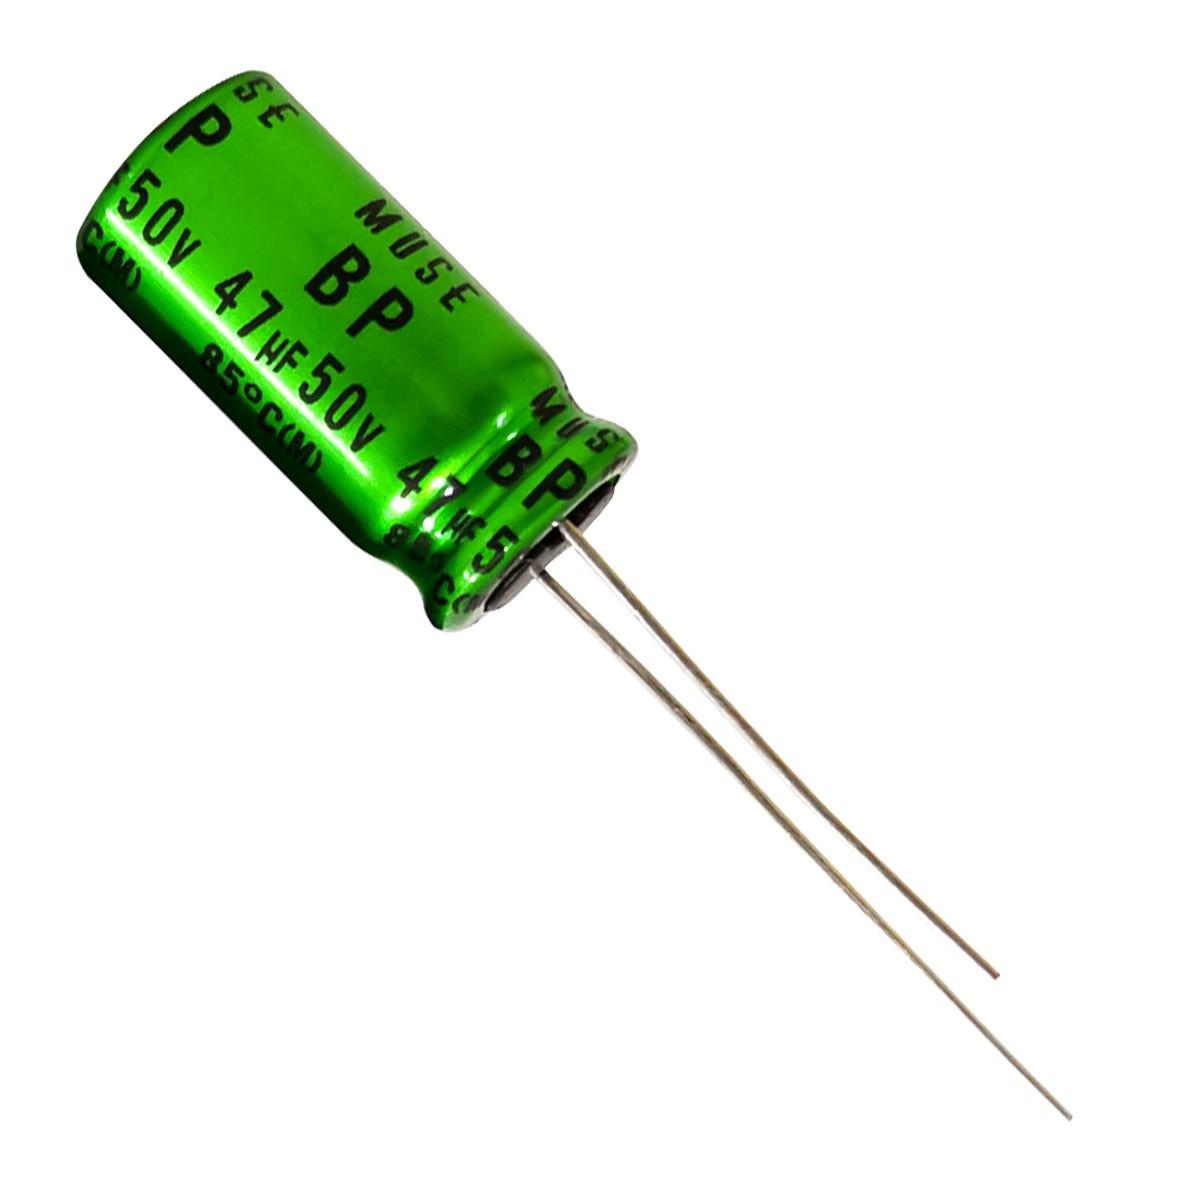 NICHICON ES MUSE Condensateur Audio Audiophile 25V 10µF